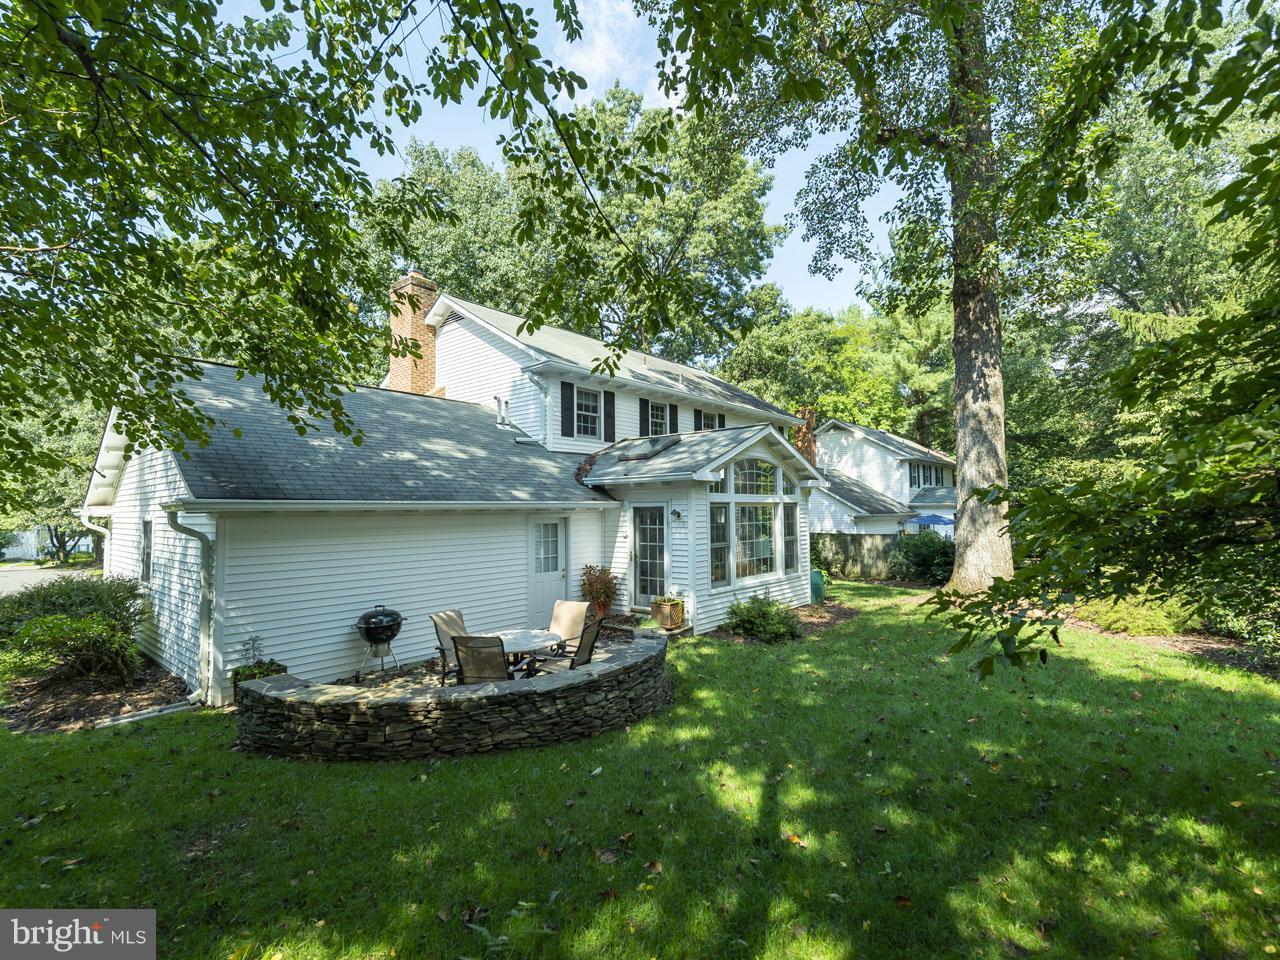 1006211278-300688039230-2021-07-22-07-39-39        Burke Delaware Real Estate For Sale   MLS# 1006211278  - Best of Northern Virginia